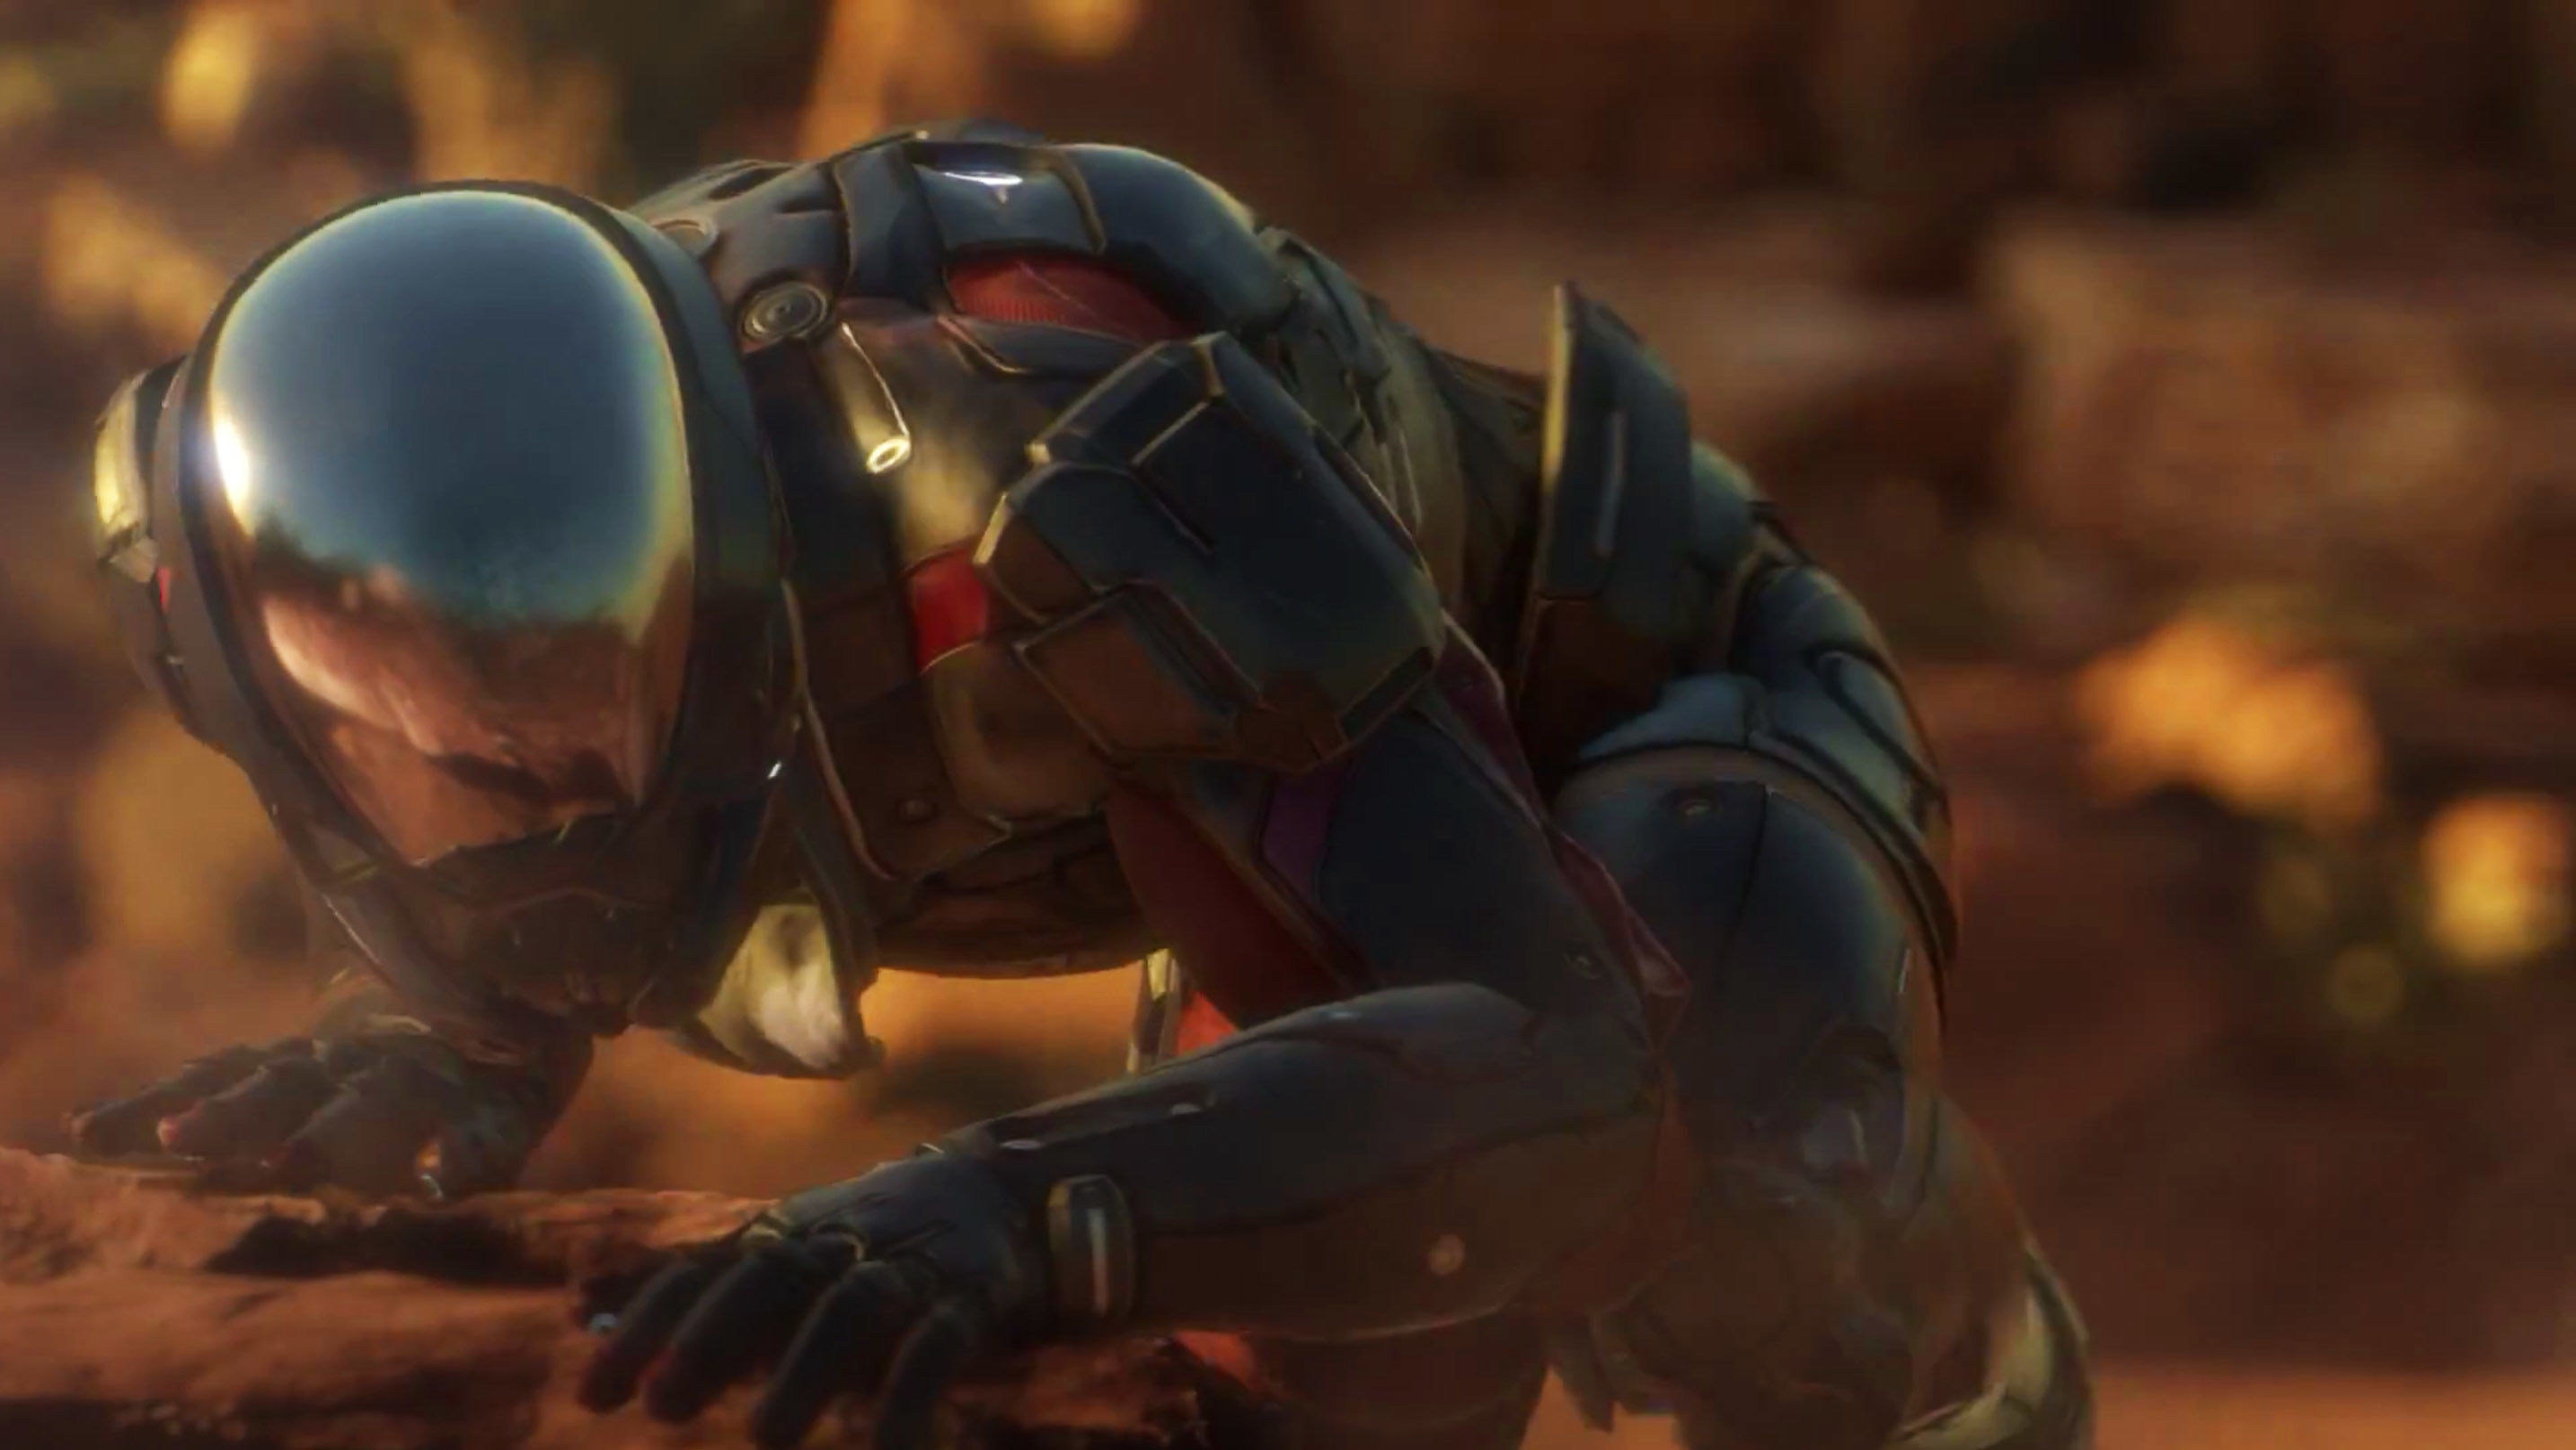 Wallpapers Games: Mass Effect Andromeda Wallpaper Download ...